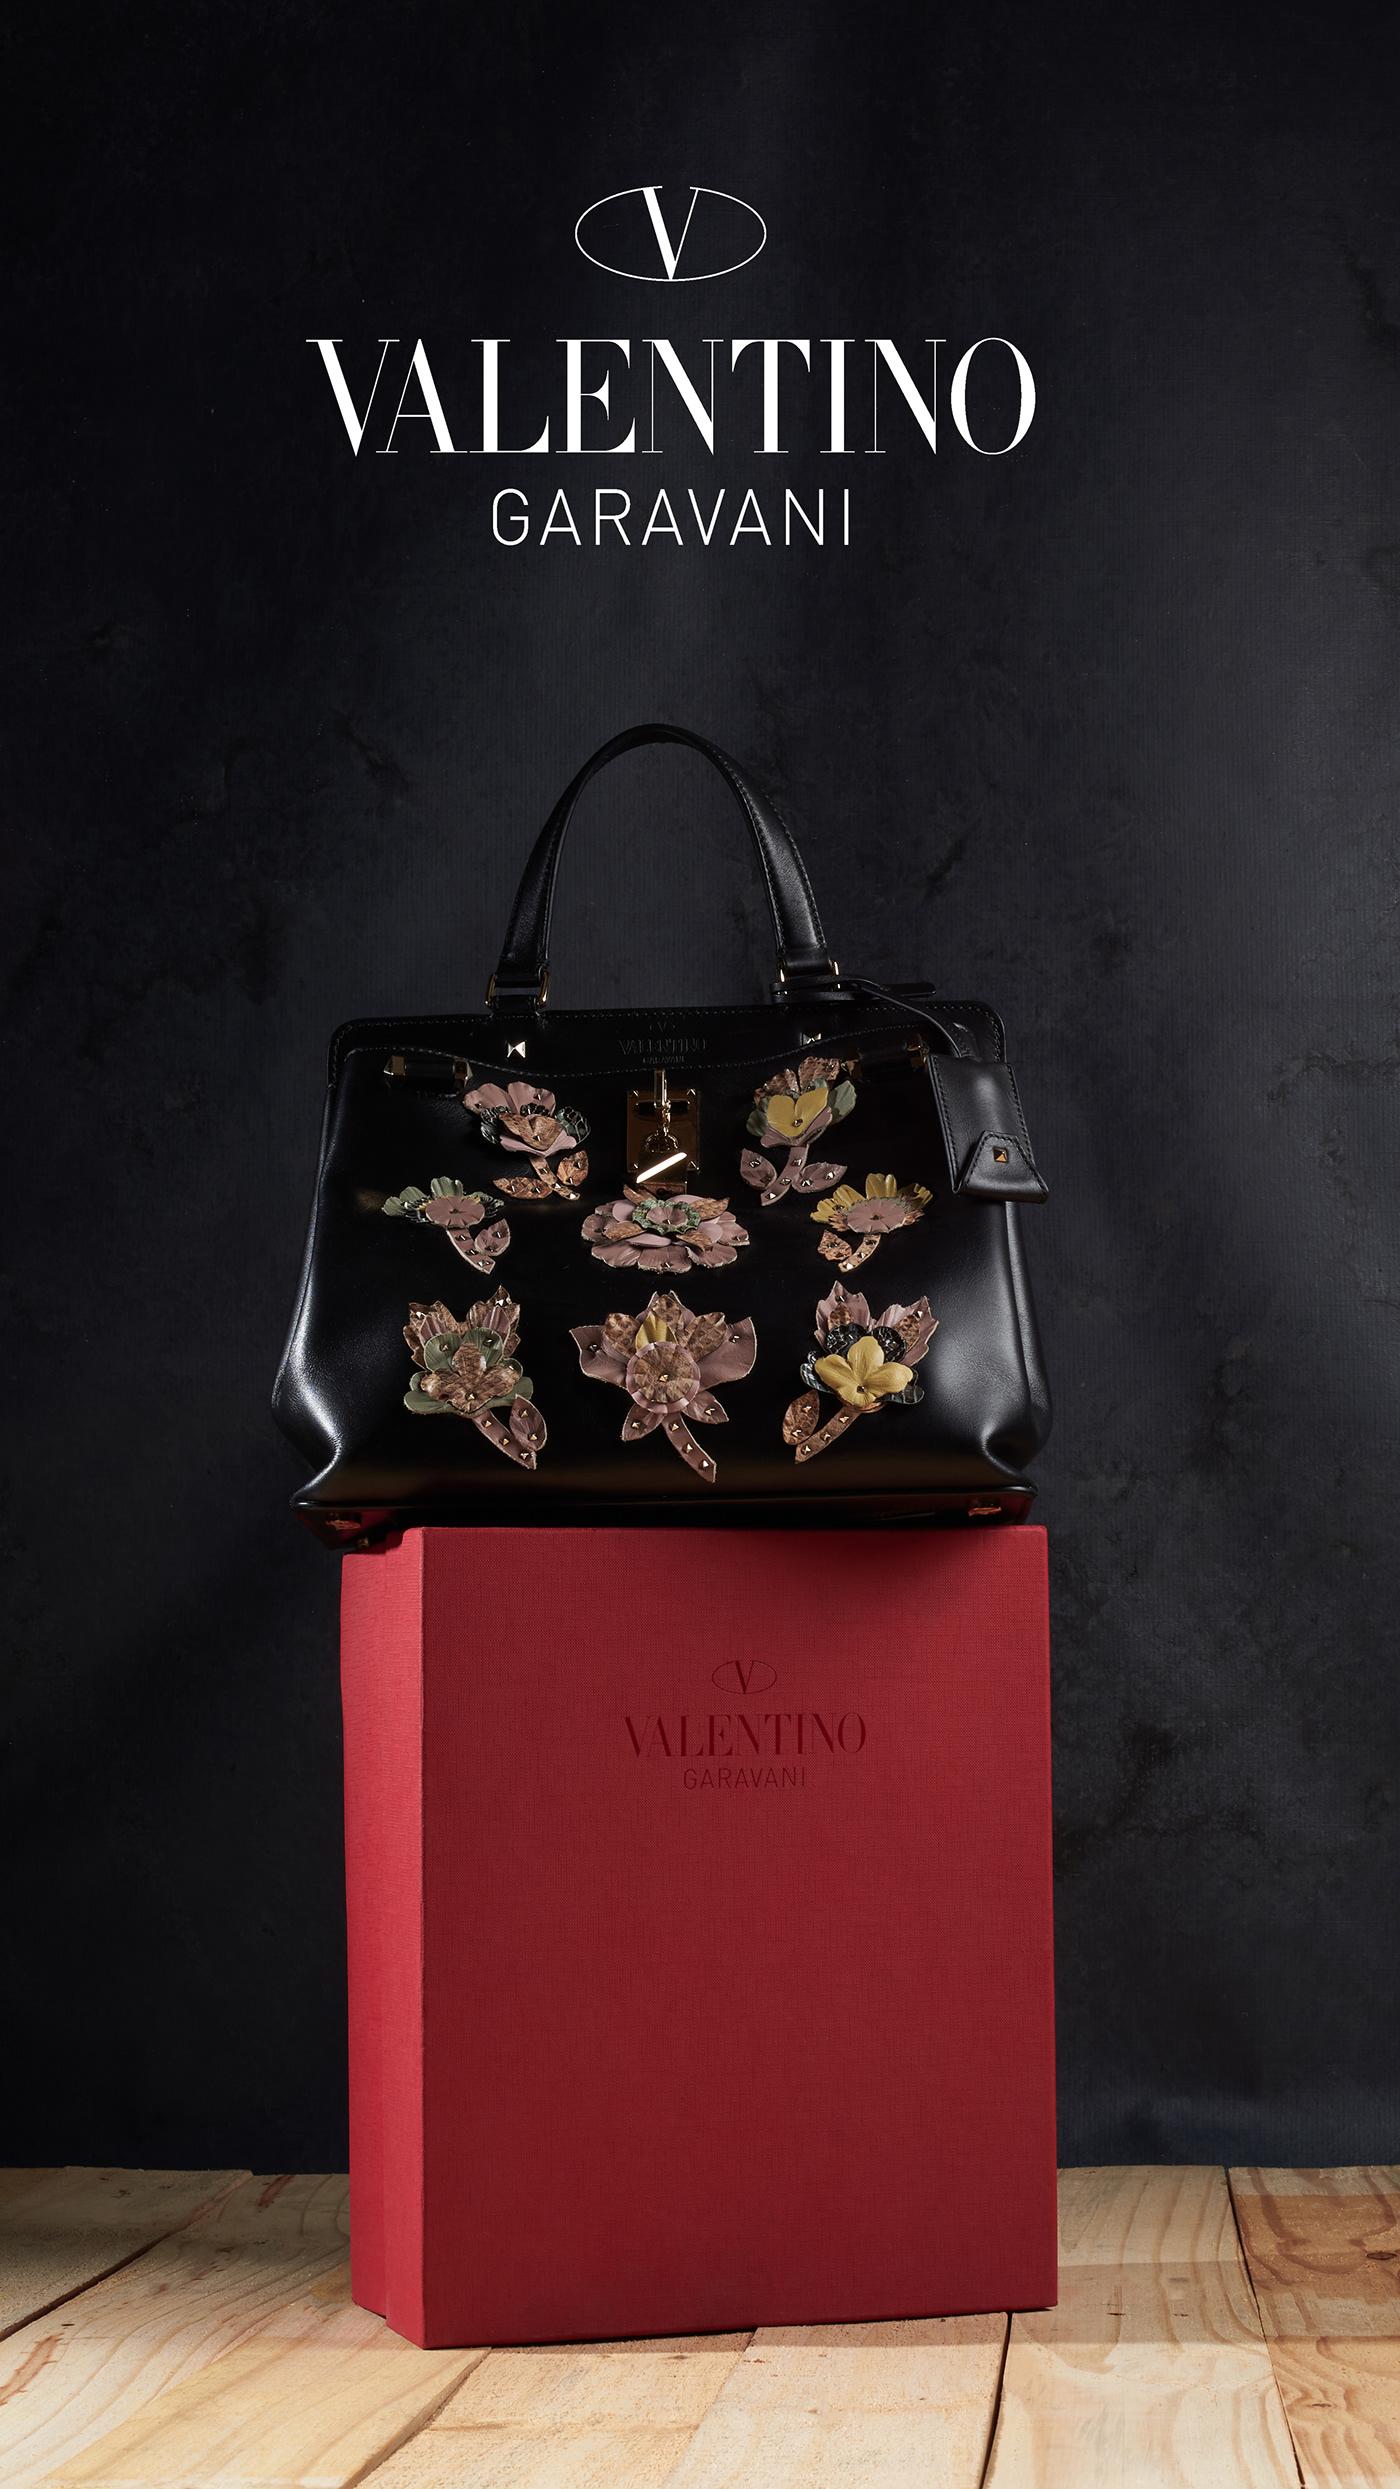 Fashion  Garavani italay Photography  product valentino